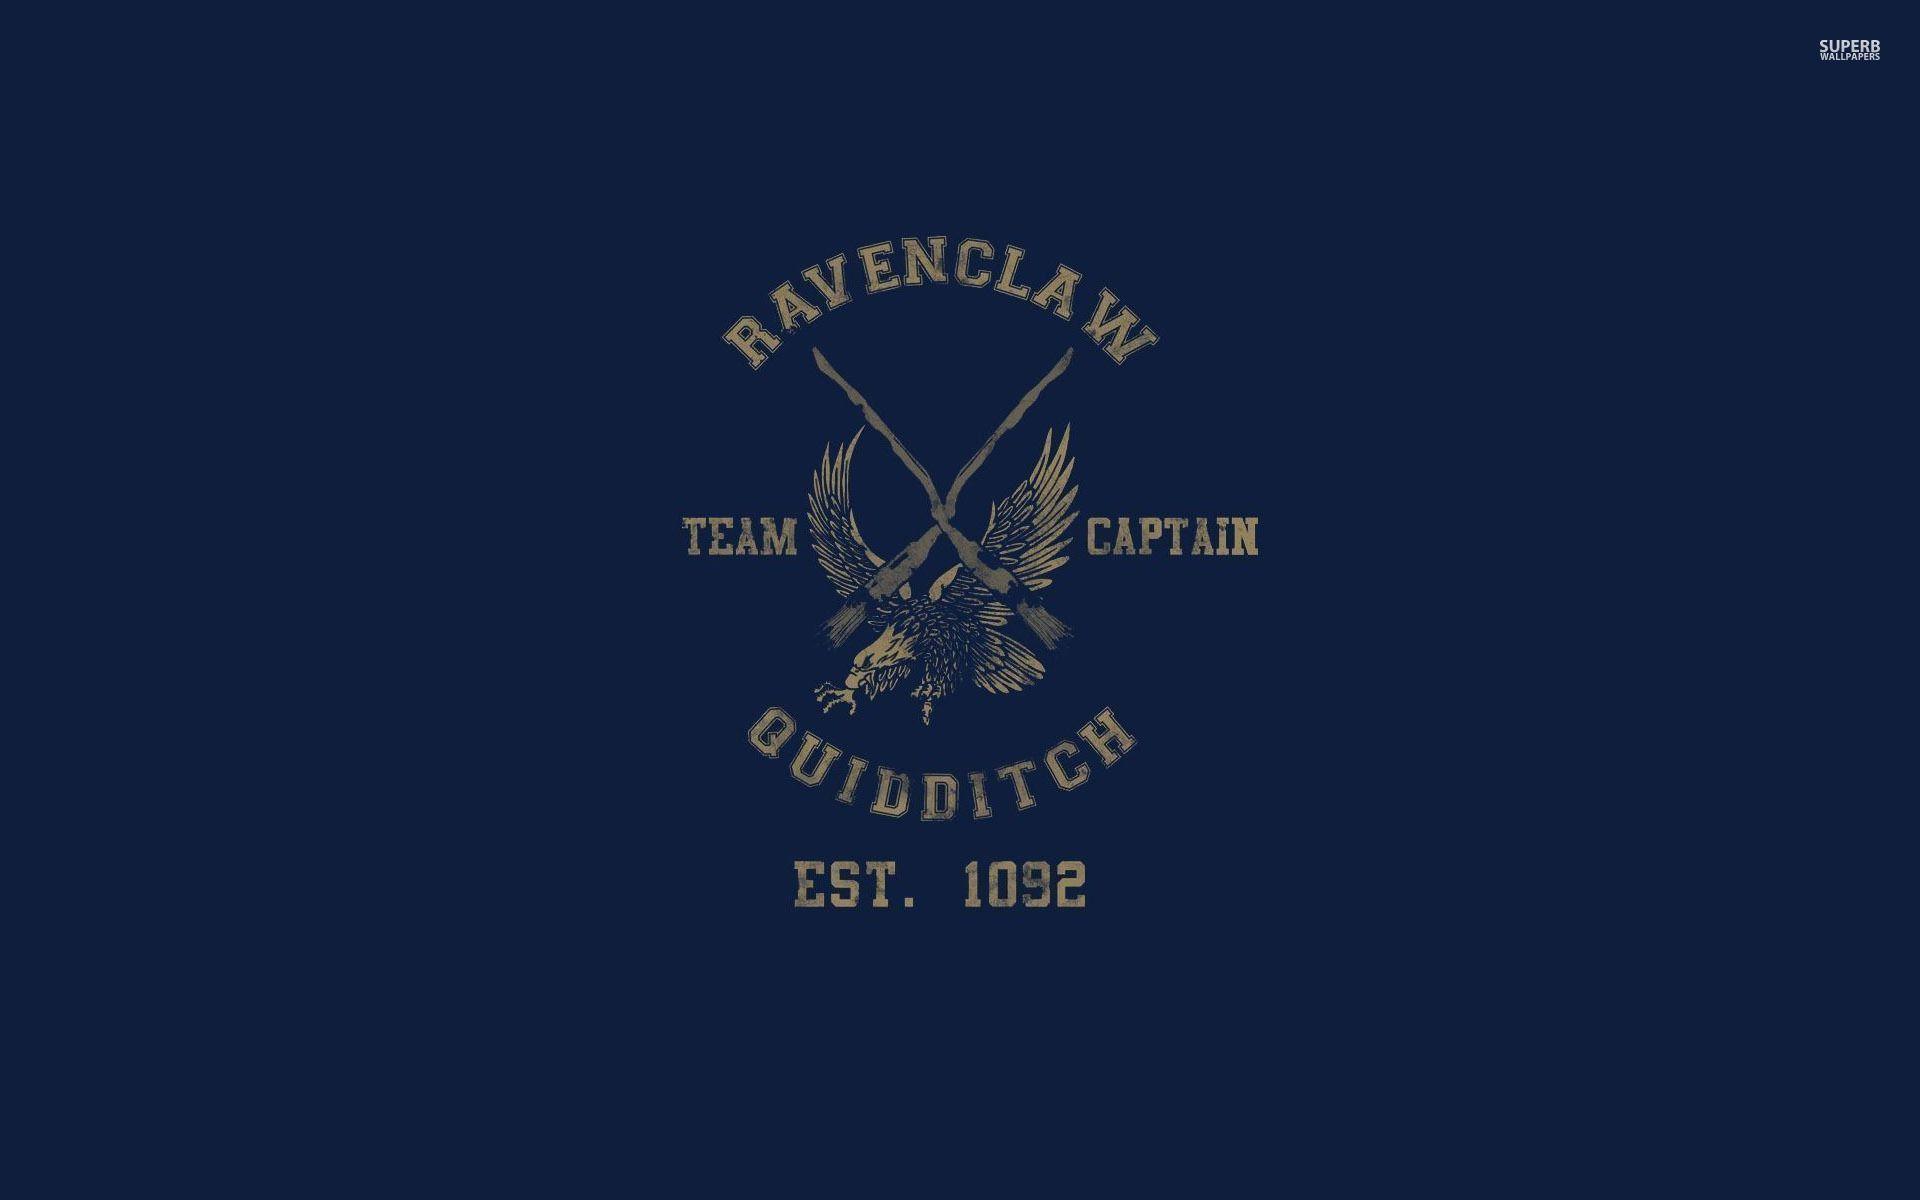 Ravenclaw Quidditch team – Harry Potter wallpaper – Vector .